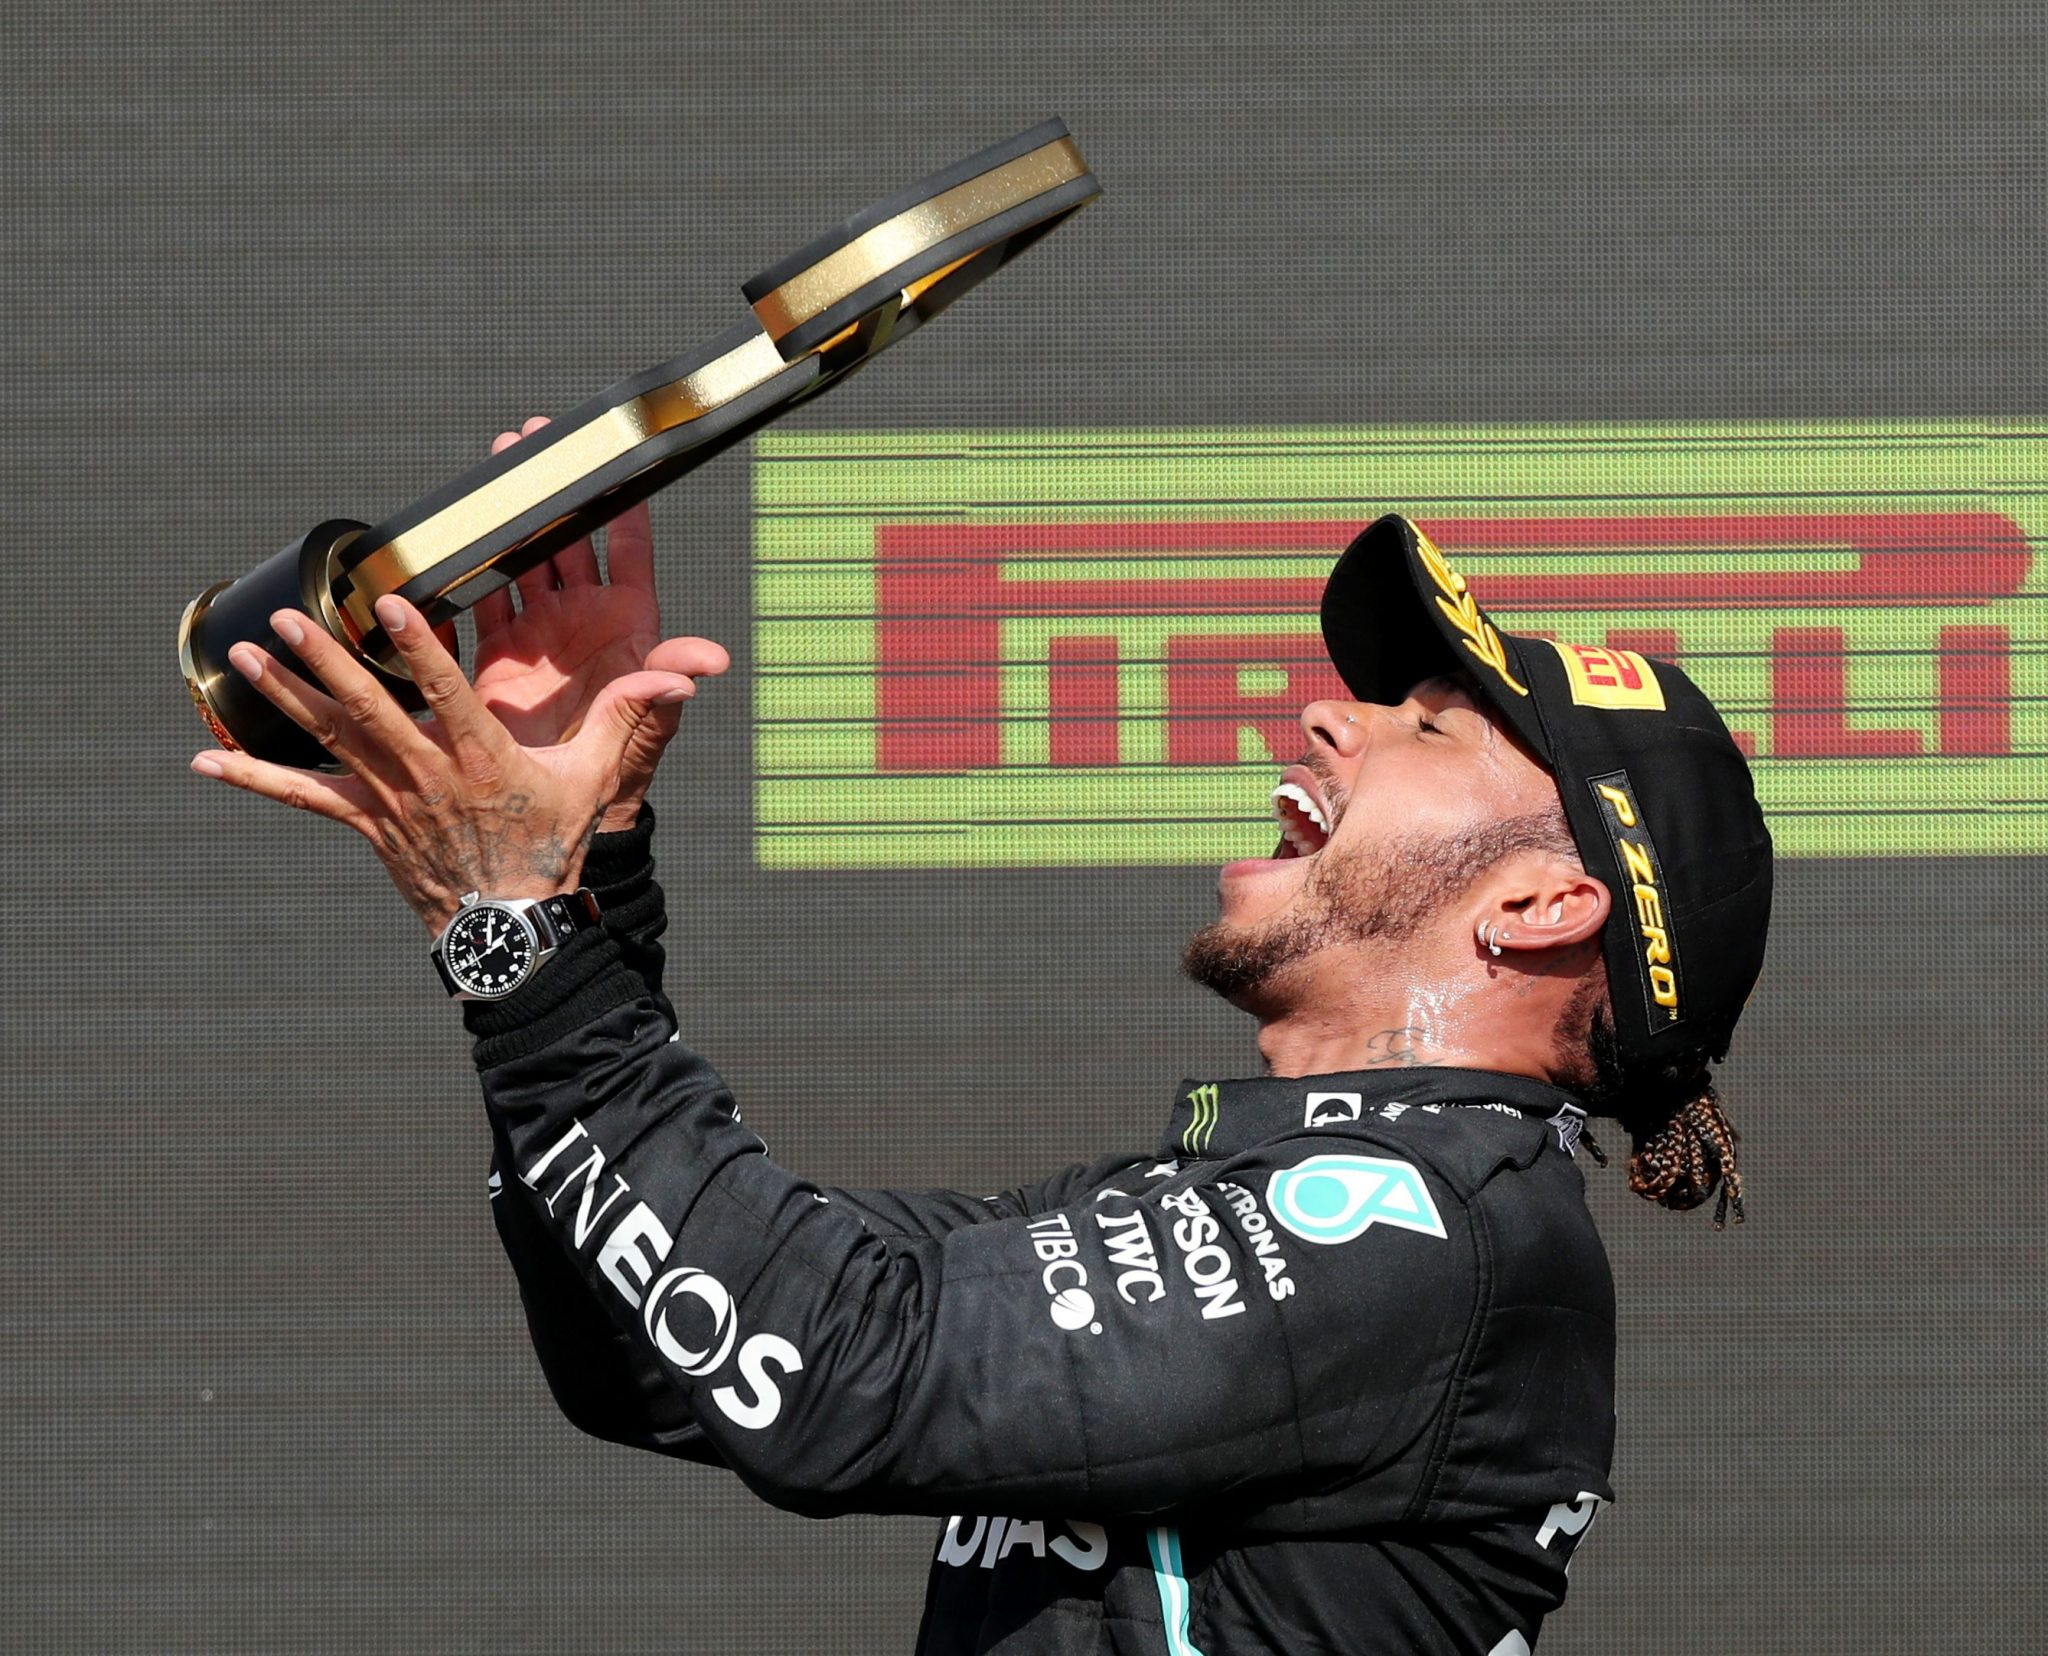 Lewis Hamilton wins British Grand Prix 2021 | லூயிஸ் ஹாமில்டன் பிரிட்டிஷ் கிராண்ட் பிரிக்ஸ் 2021 ஐ வென்றார் |_40.1